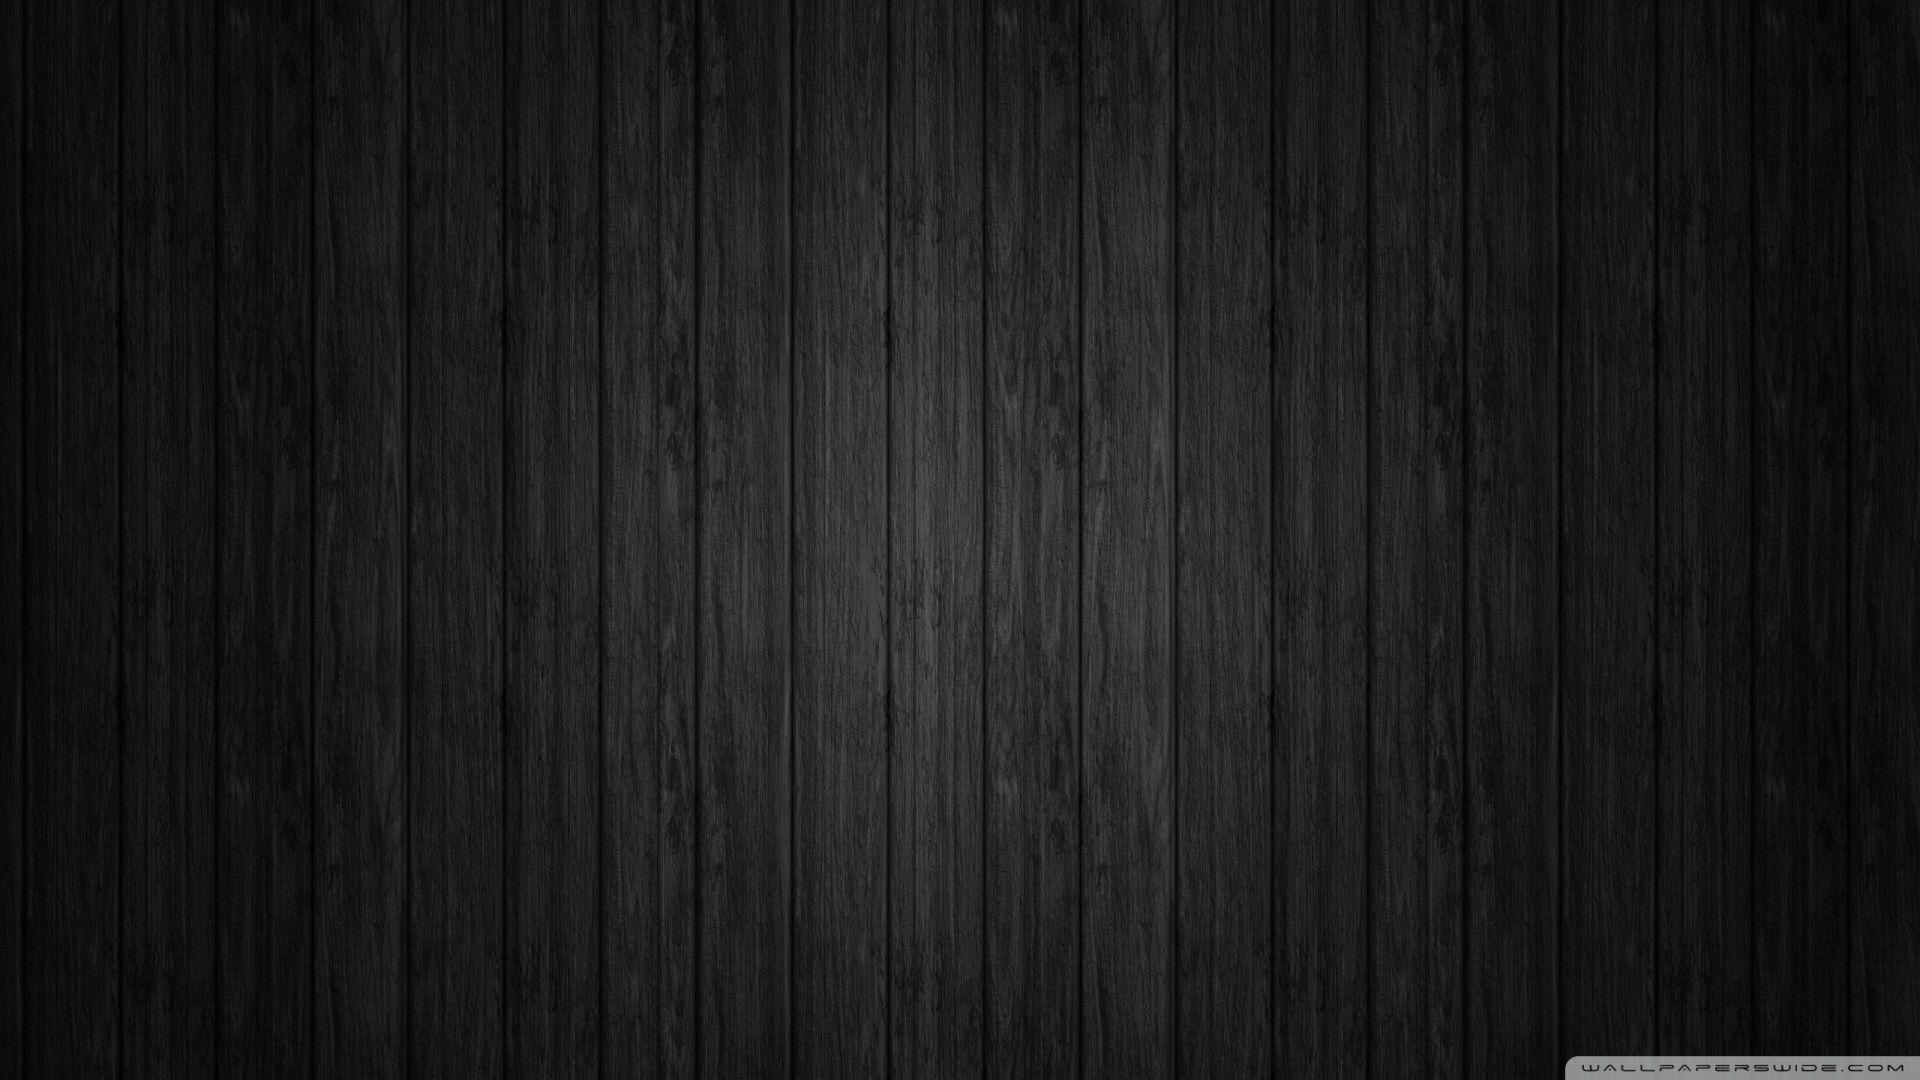 Background Putih Polos Hd - Koleksi Gambar HD